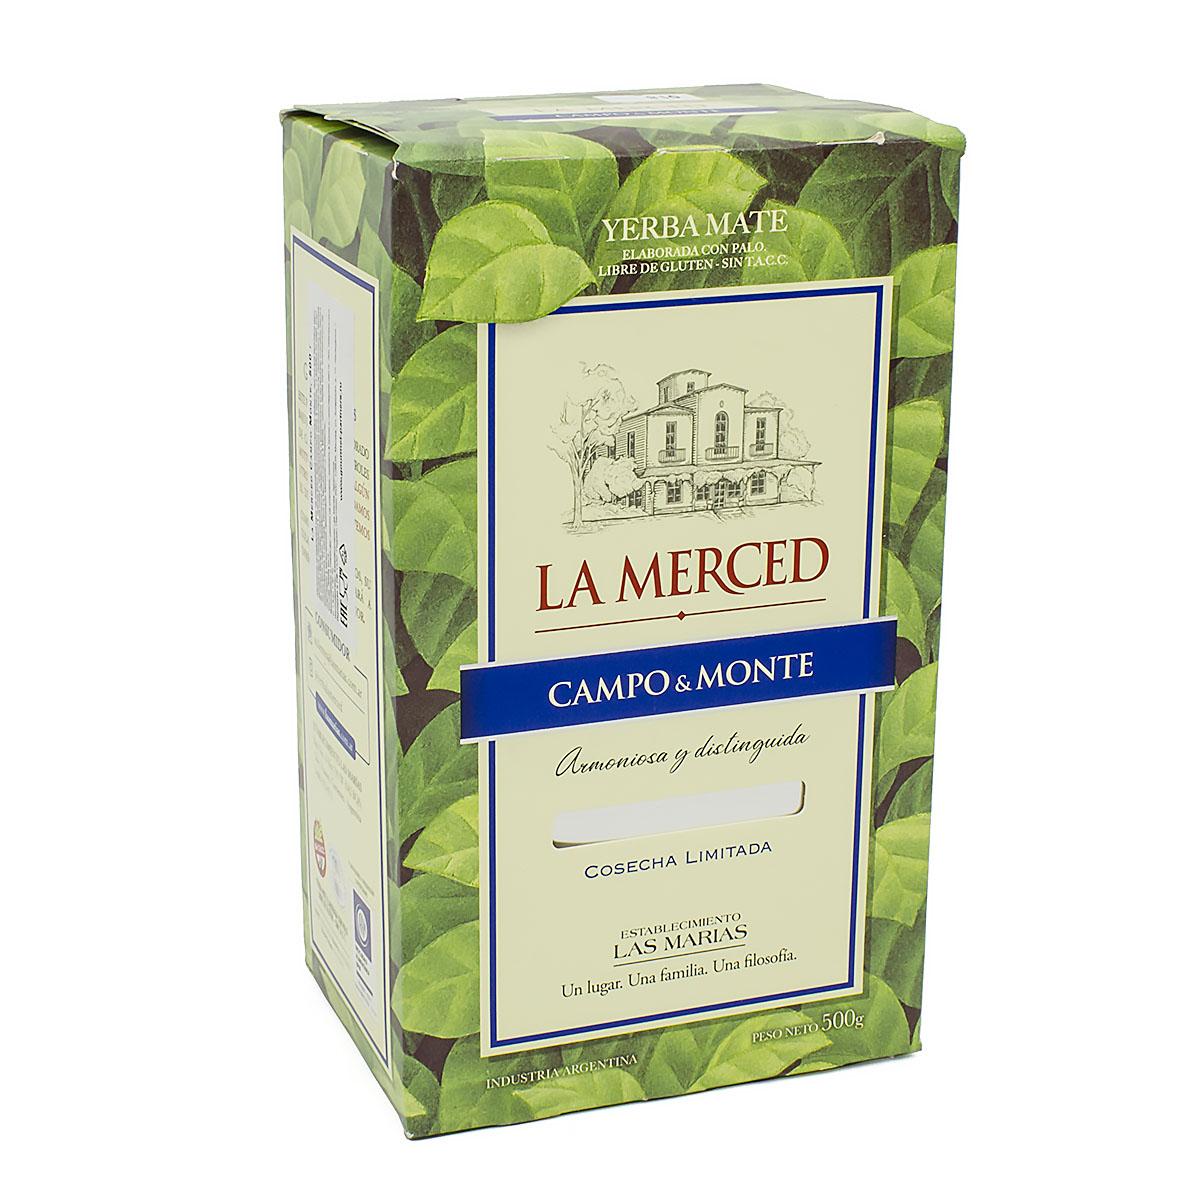 Мате La Merced Campo & Monte (микс), 500 г чай травяной la merced yerba mate campo